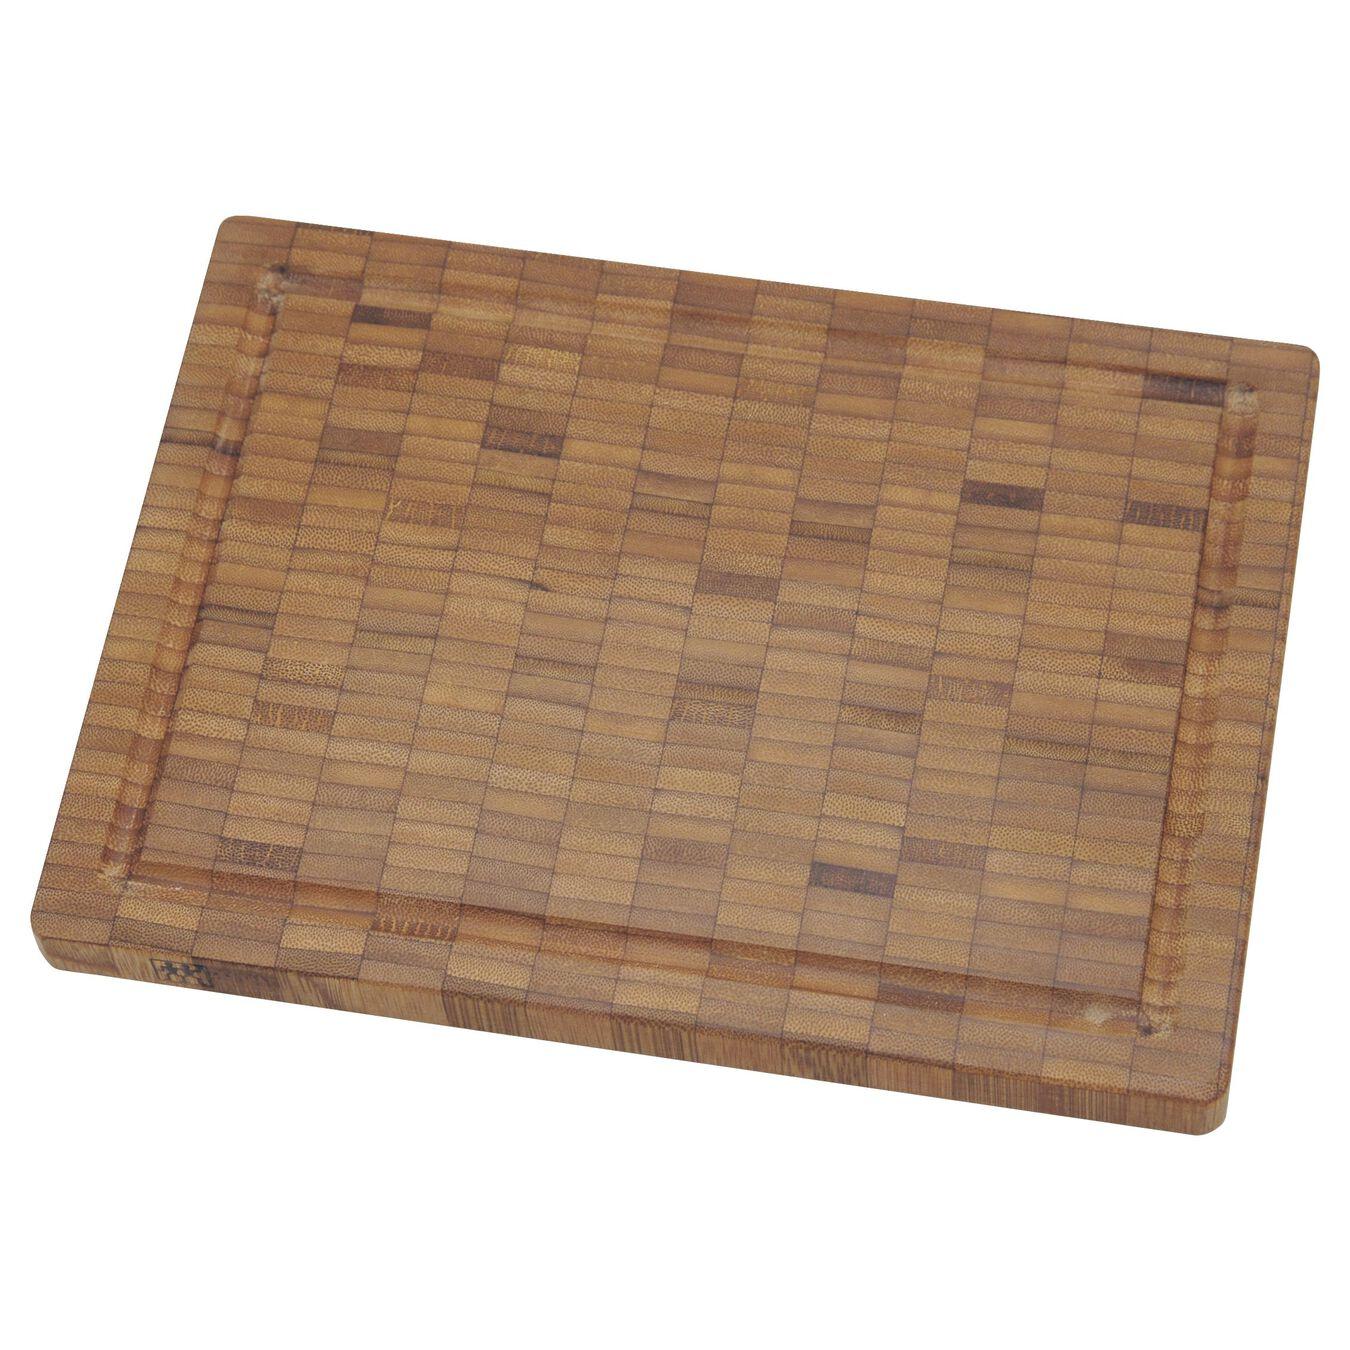 Snijplank, Bamboe,,large 1